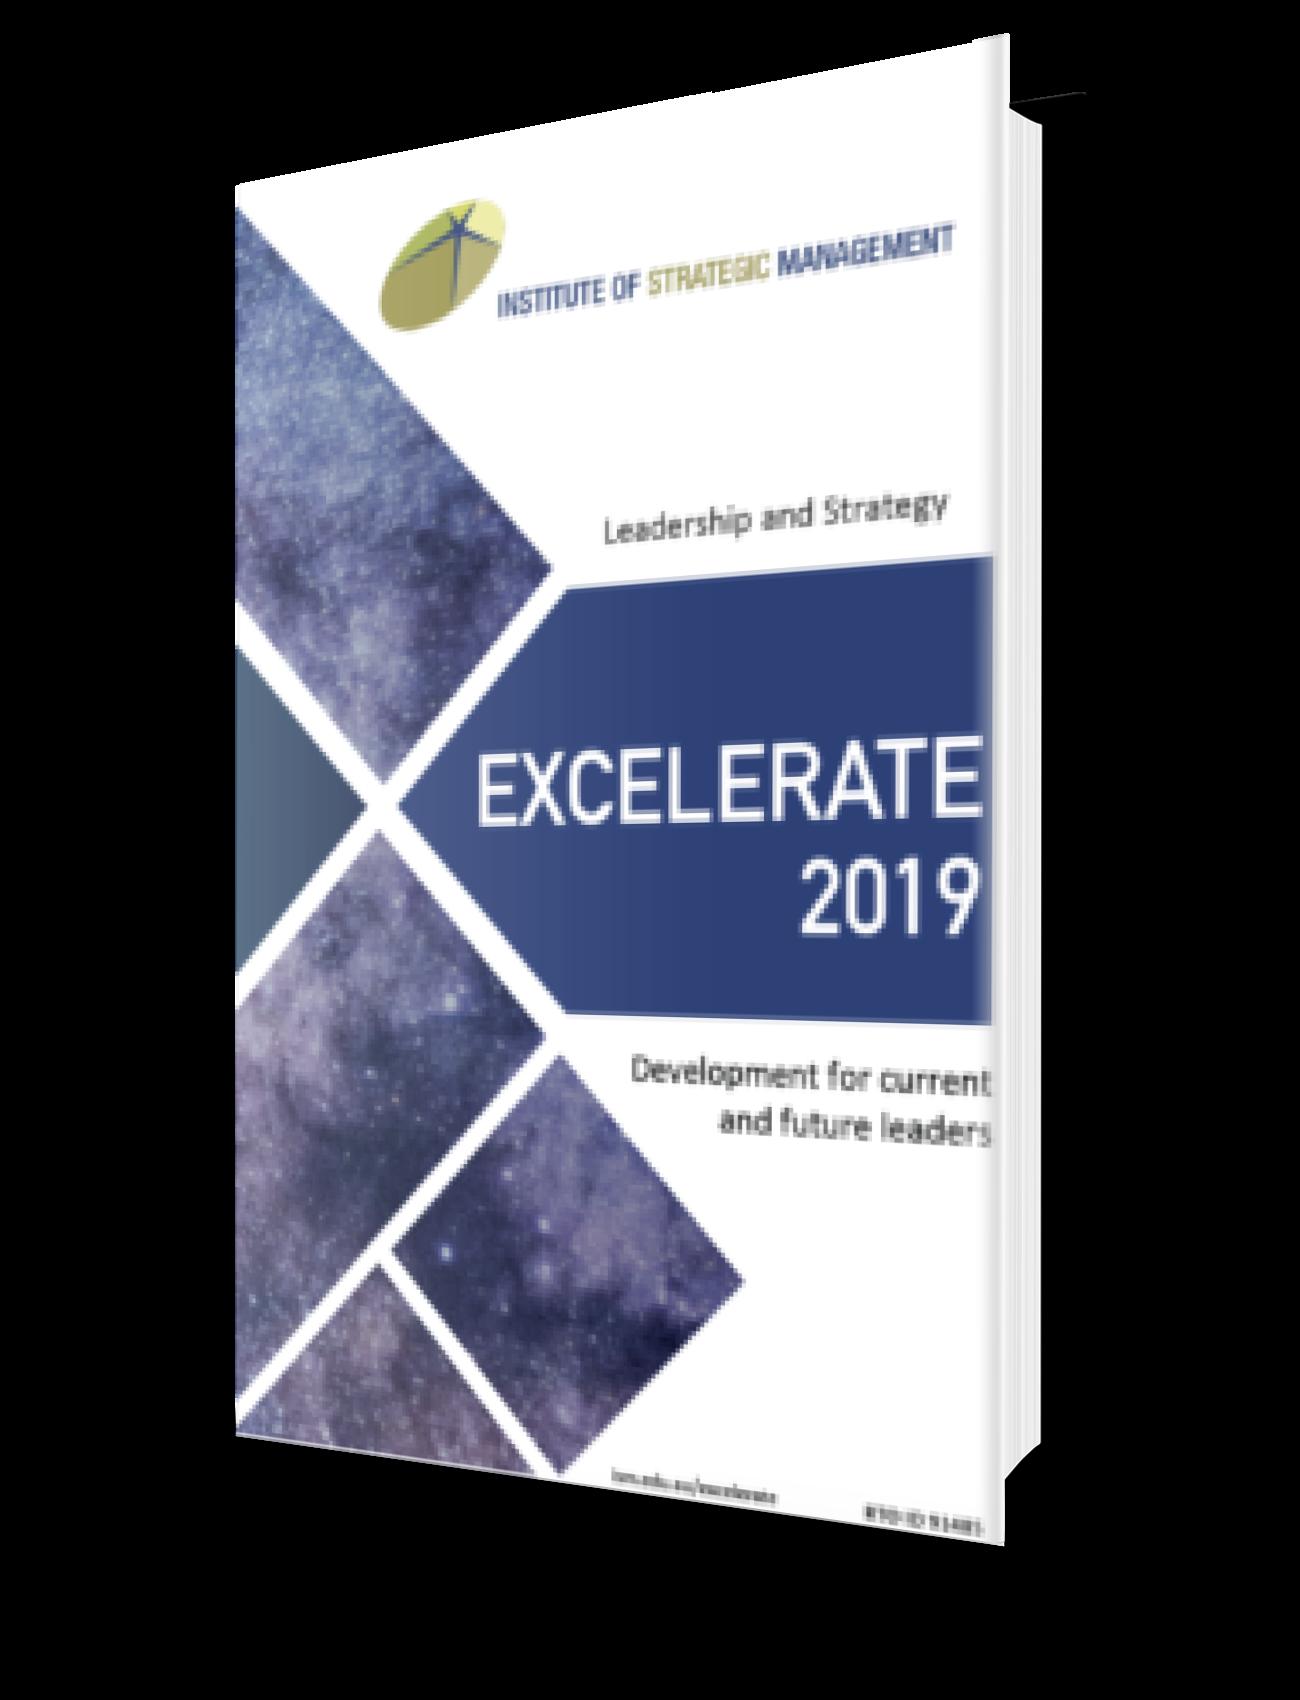 Excelerate 2019 intake 1